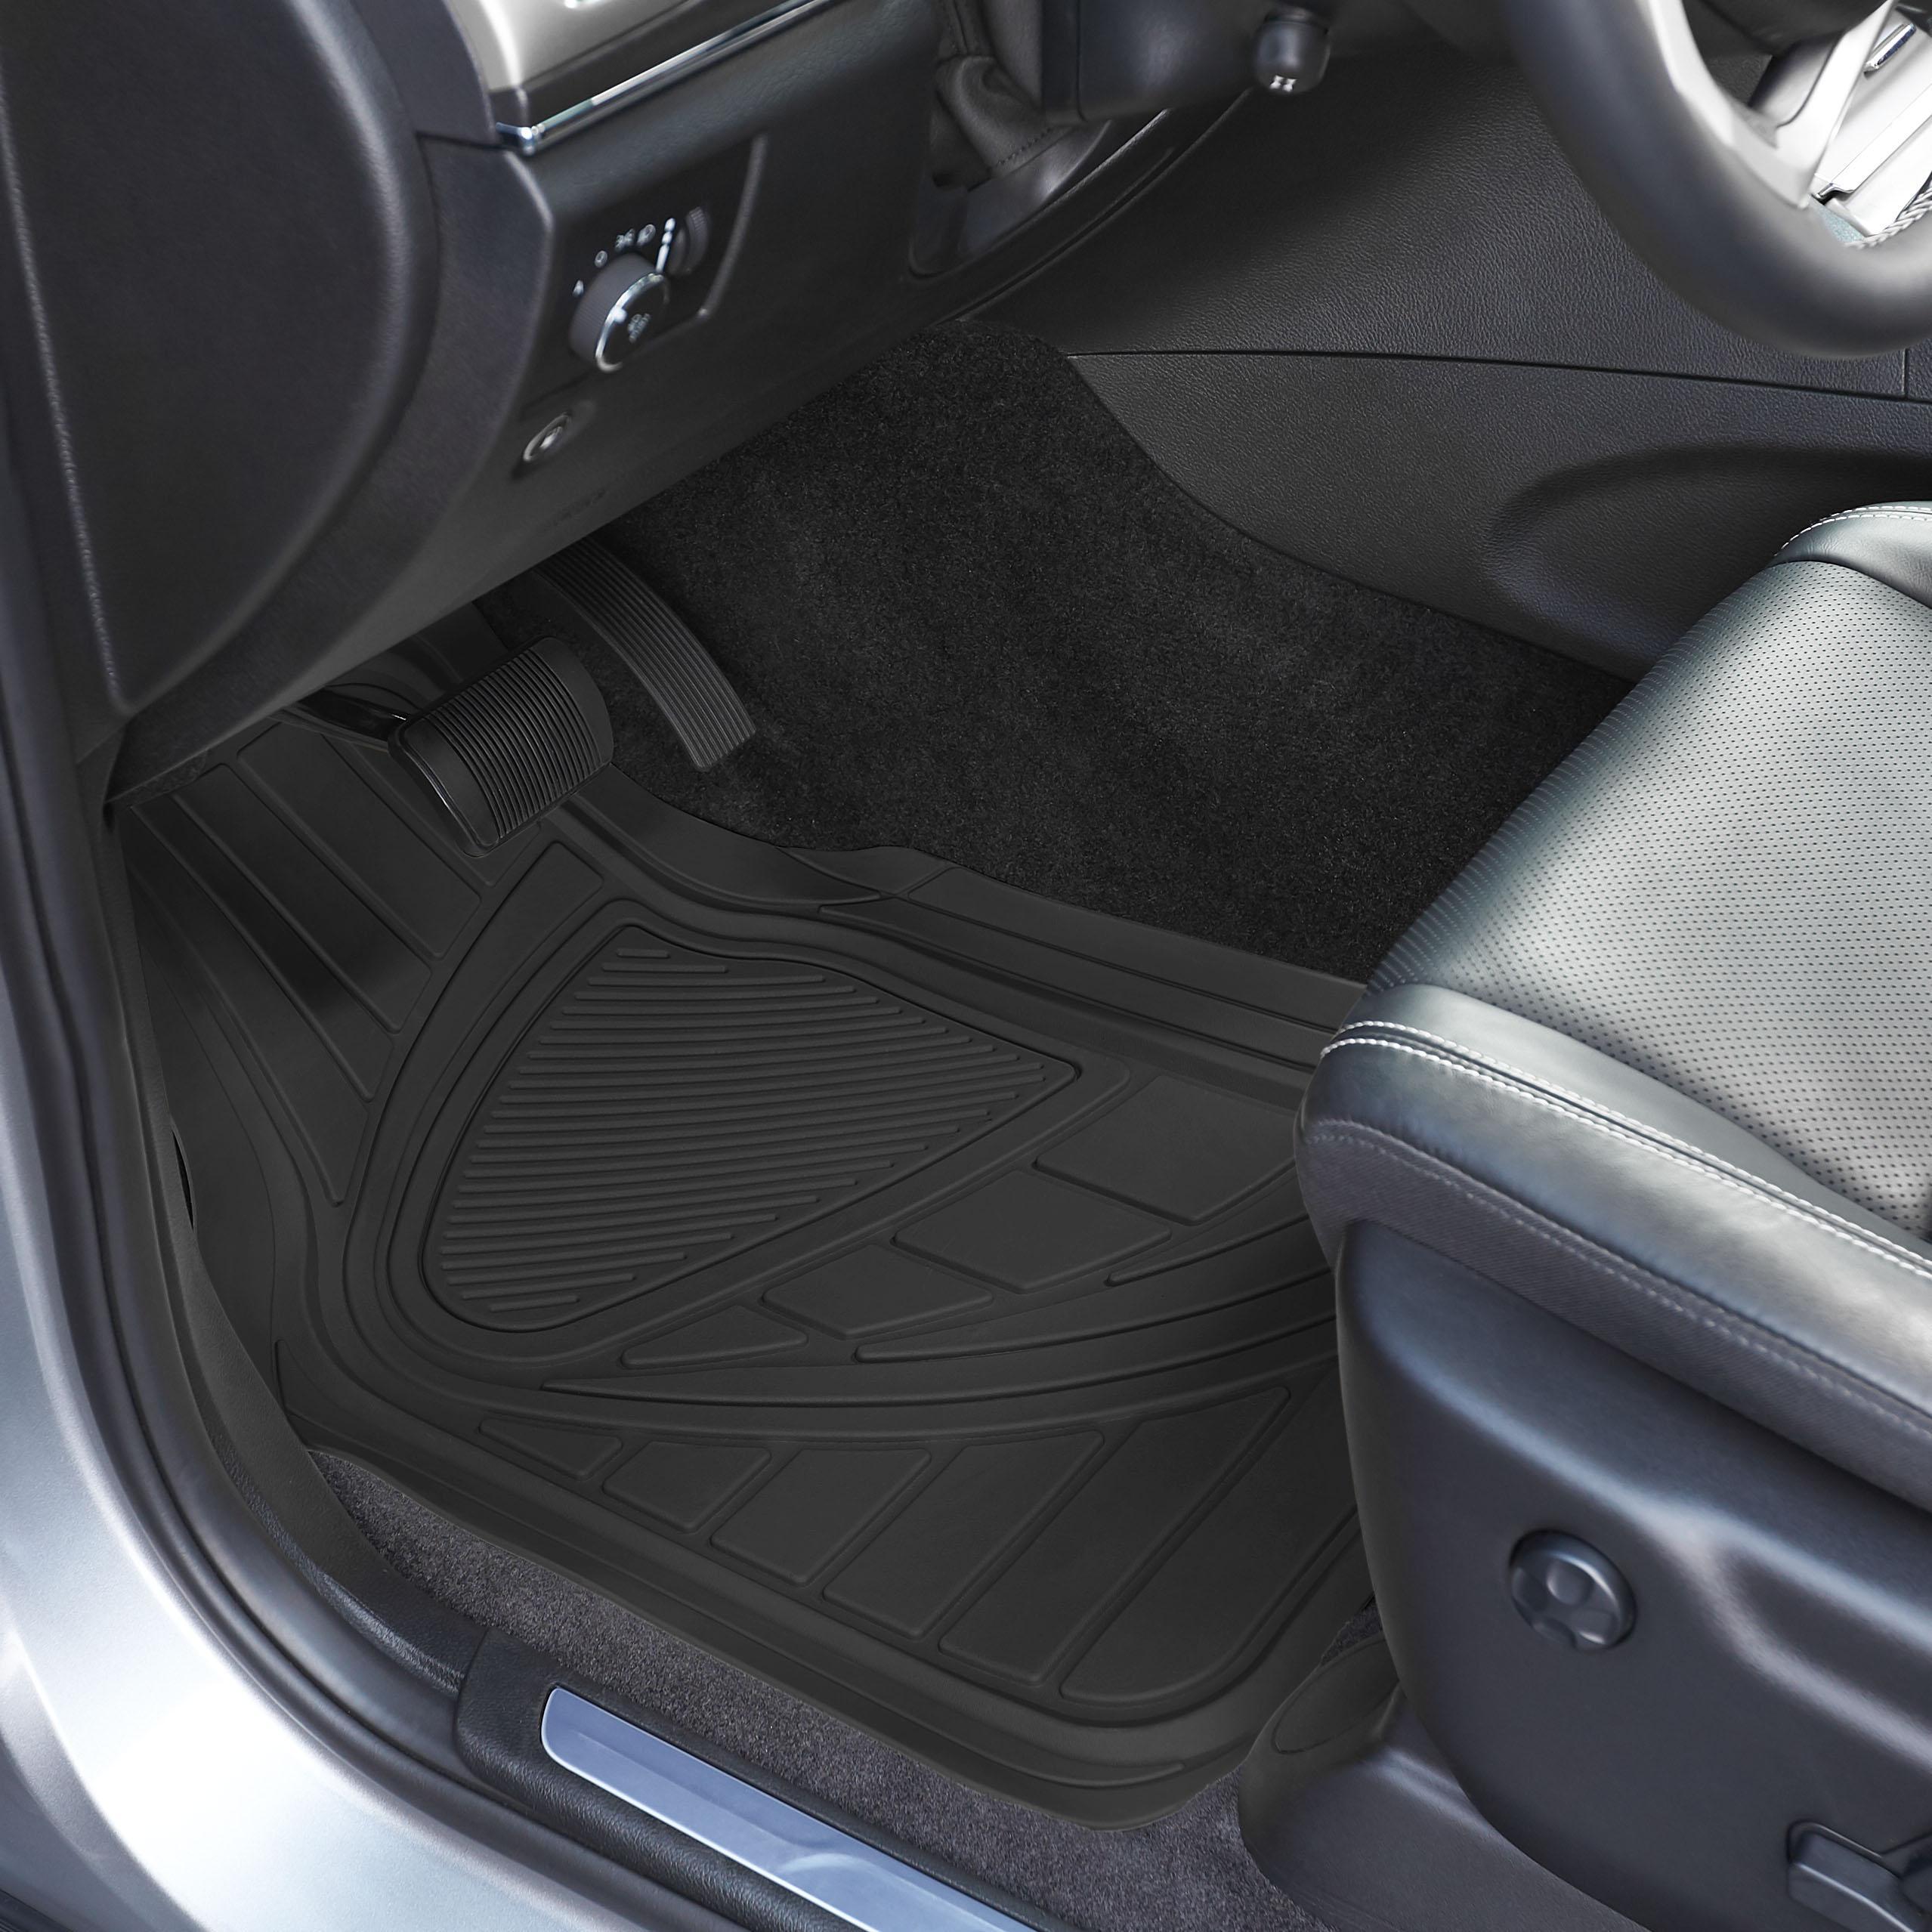 Amazon.com: AmazonBasics 4 Piece Car Floor Mat, Black